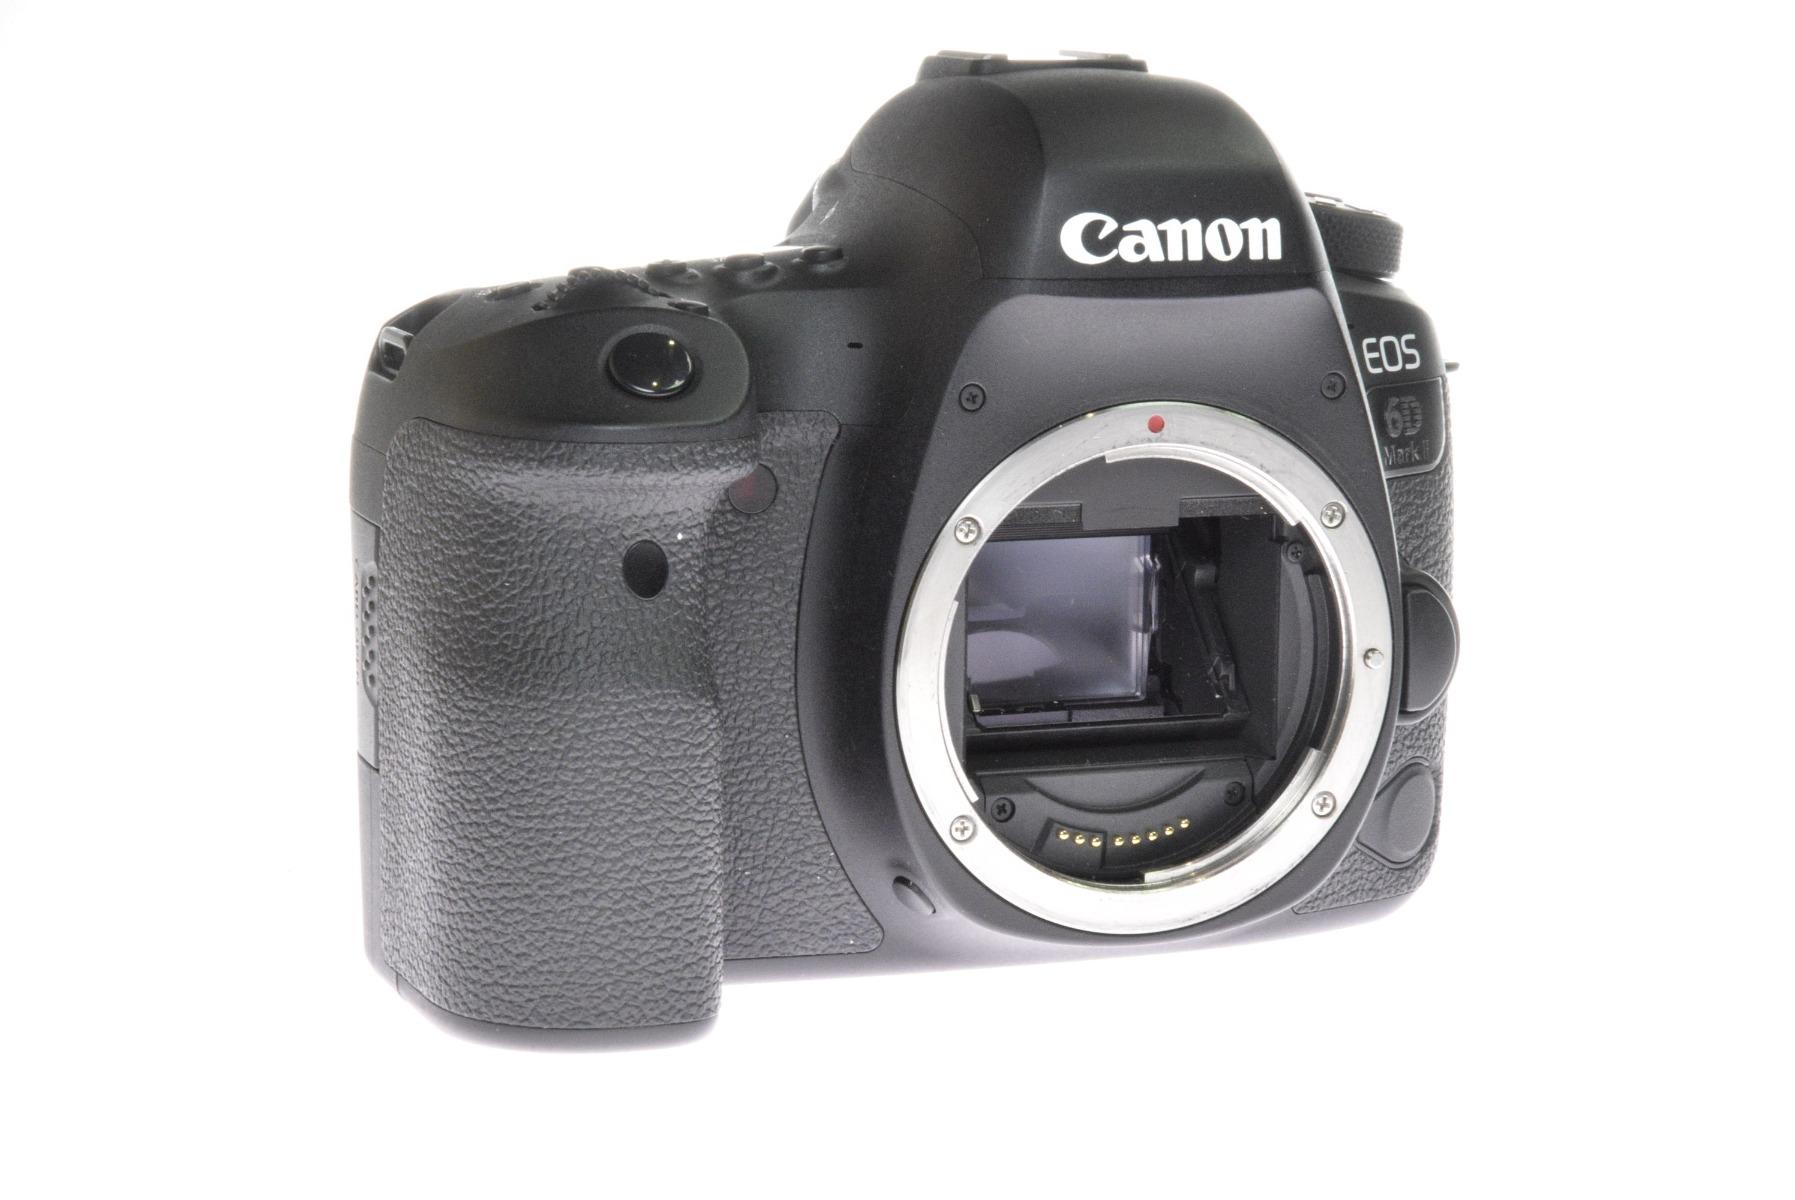 Used Canon EOS 6D Mark II DSLR Camera Body